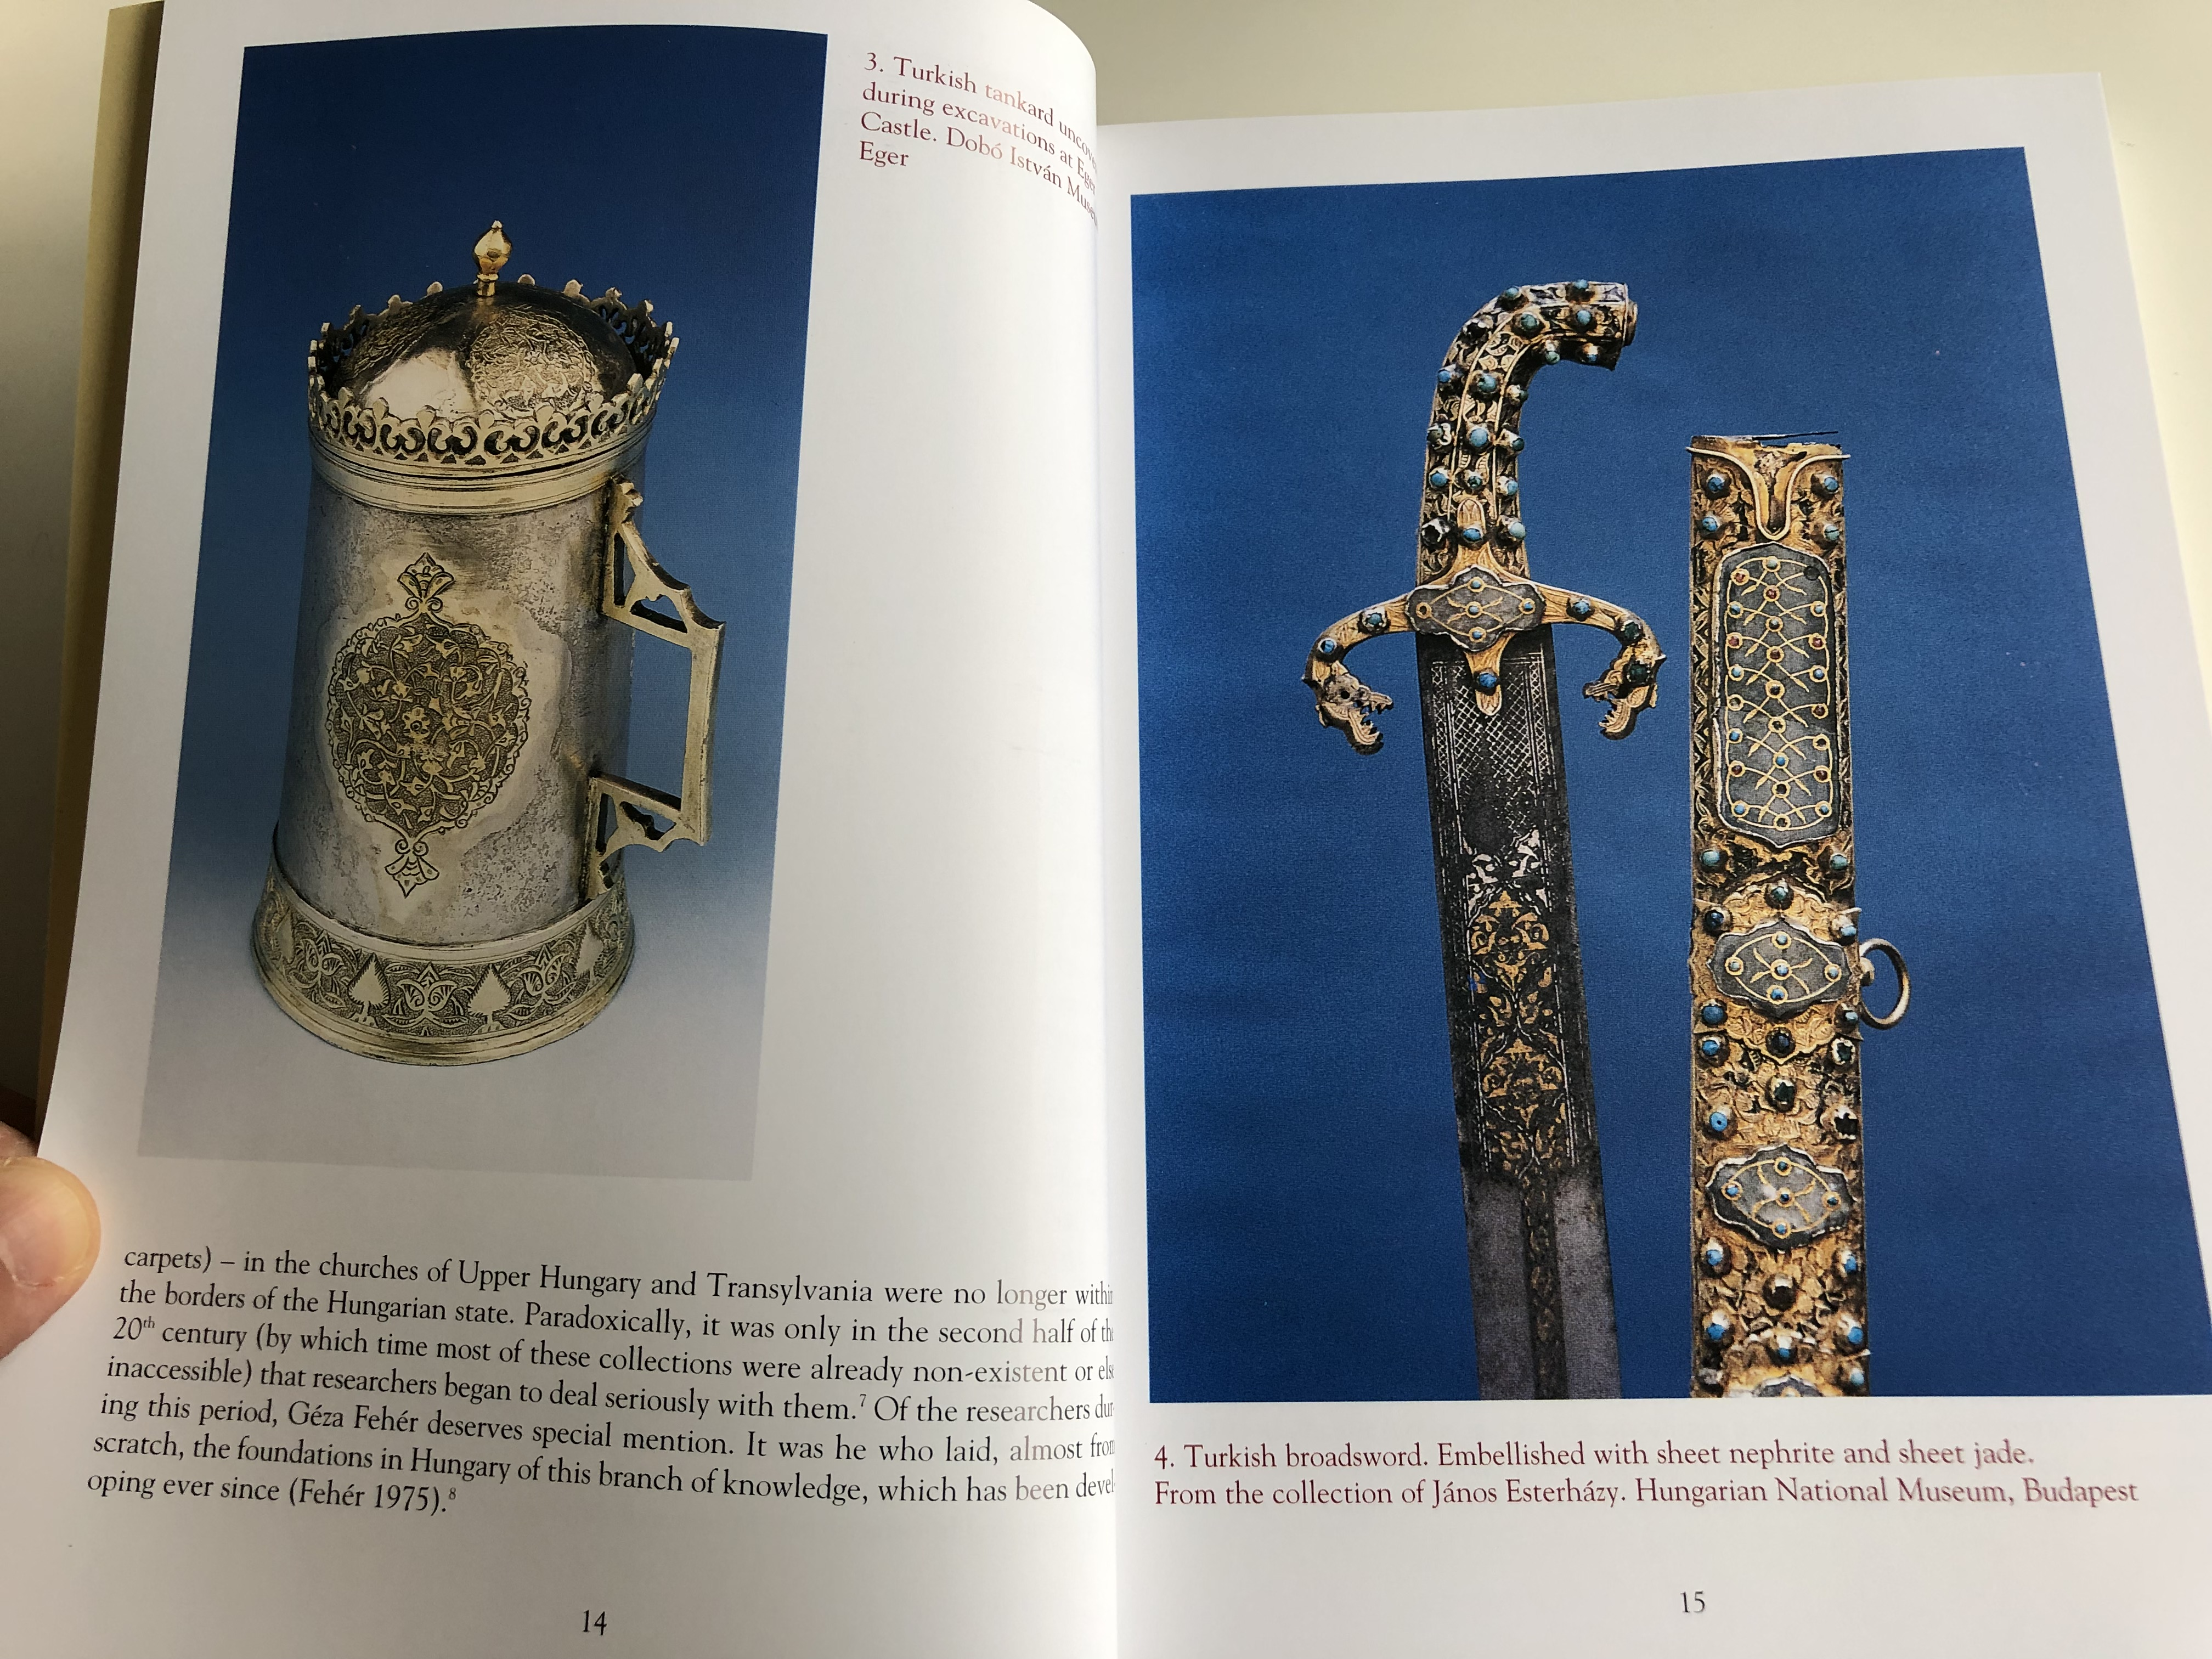 turkish-flowers-studies-on-ottoman-art-in-hungary-hungarian-national-museum-2005-editor-ibolya-gerelyes-8-.jpg